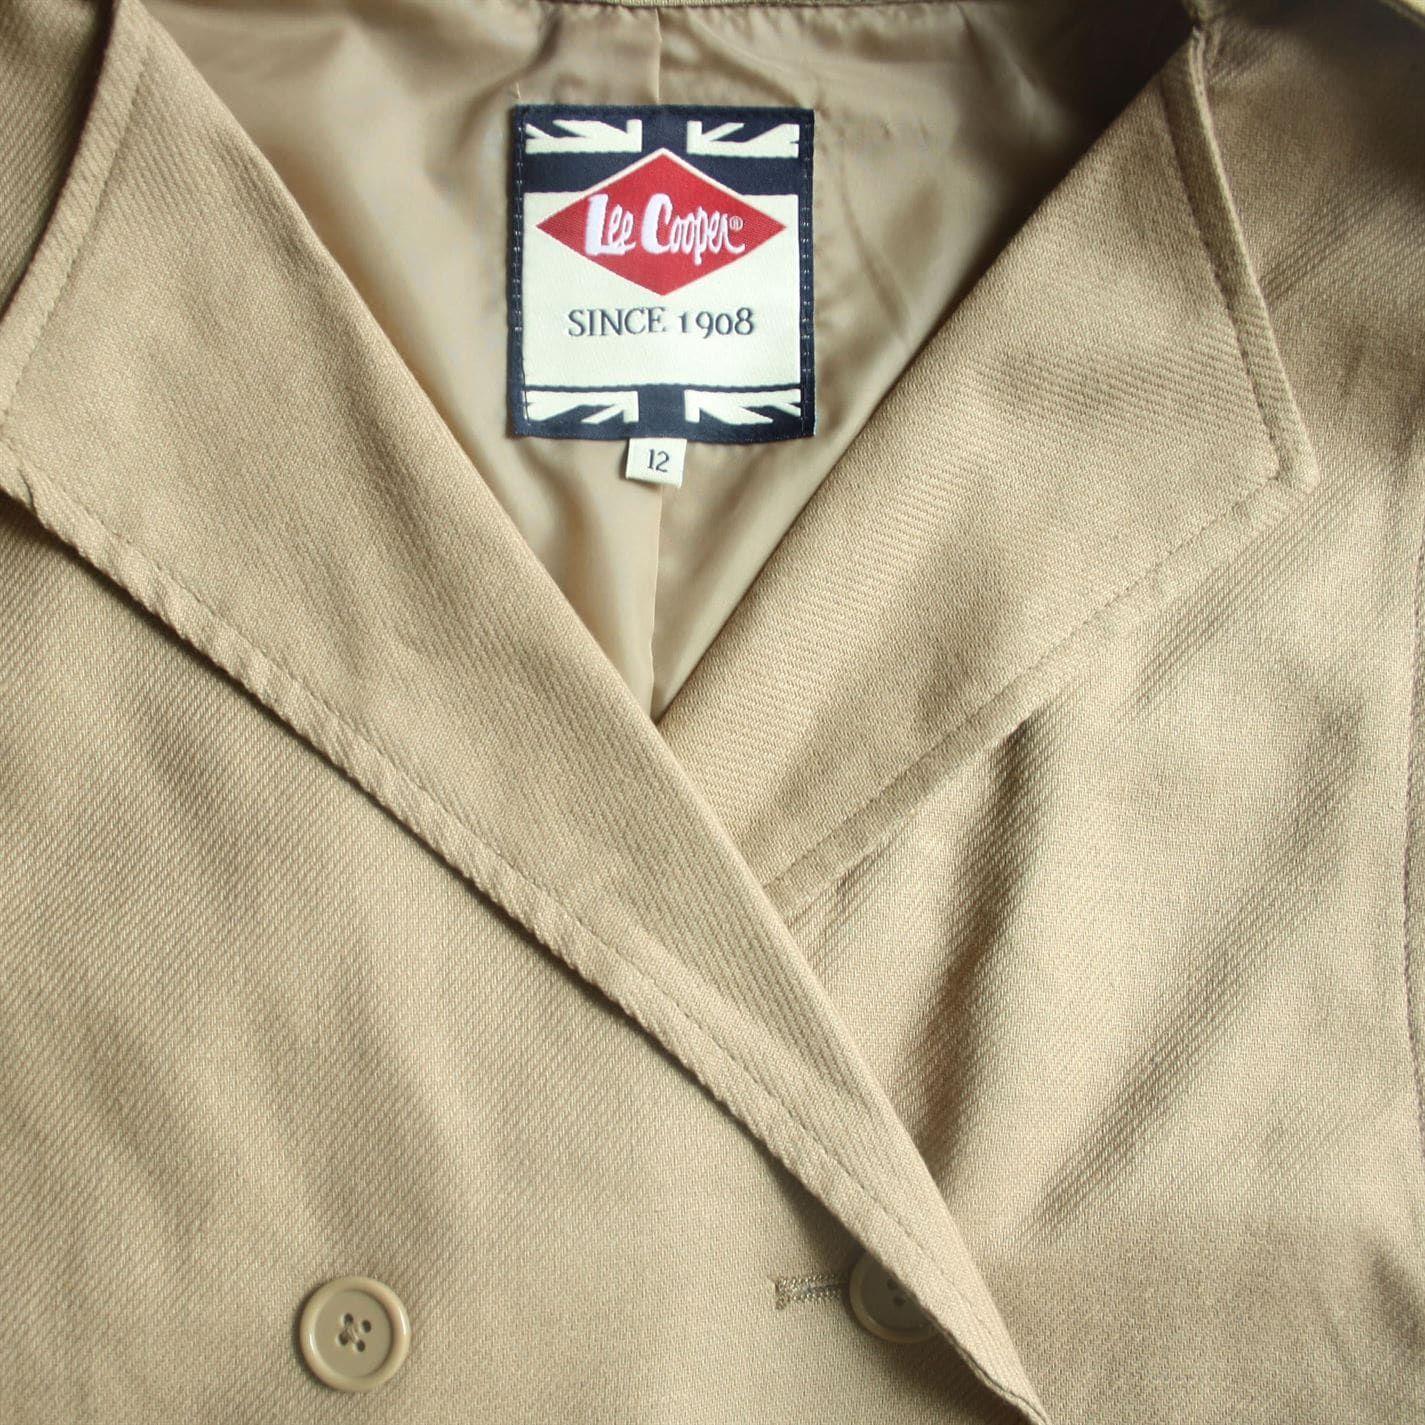 939f126b295 Lee Cooper - Γυναικείο παλτό (669252-66925299) - Woomie.gr